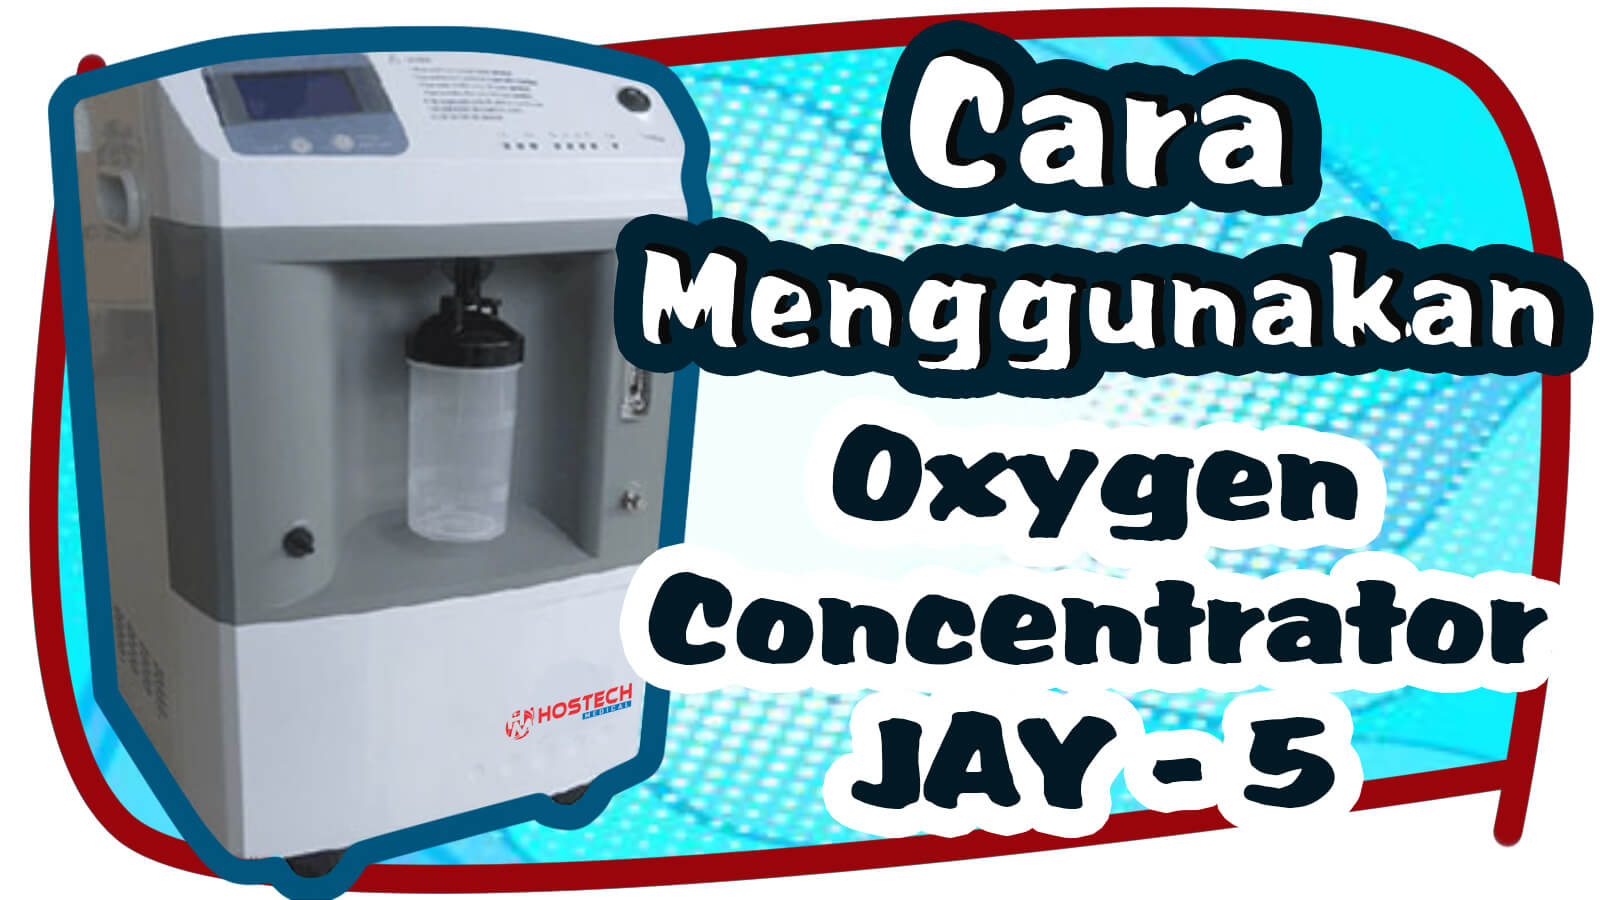 Oxygen Concentrator adalah merupakan alat elektronik yang dapat memberikan oksigen murni untuk tubuh.